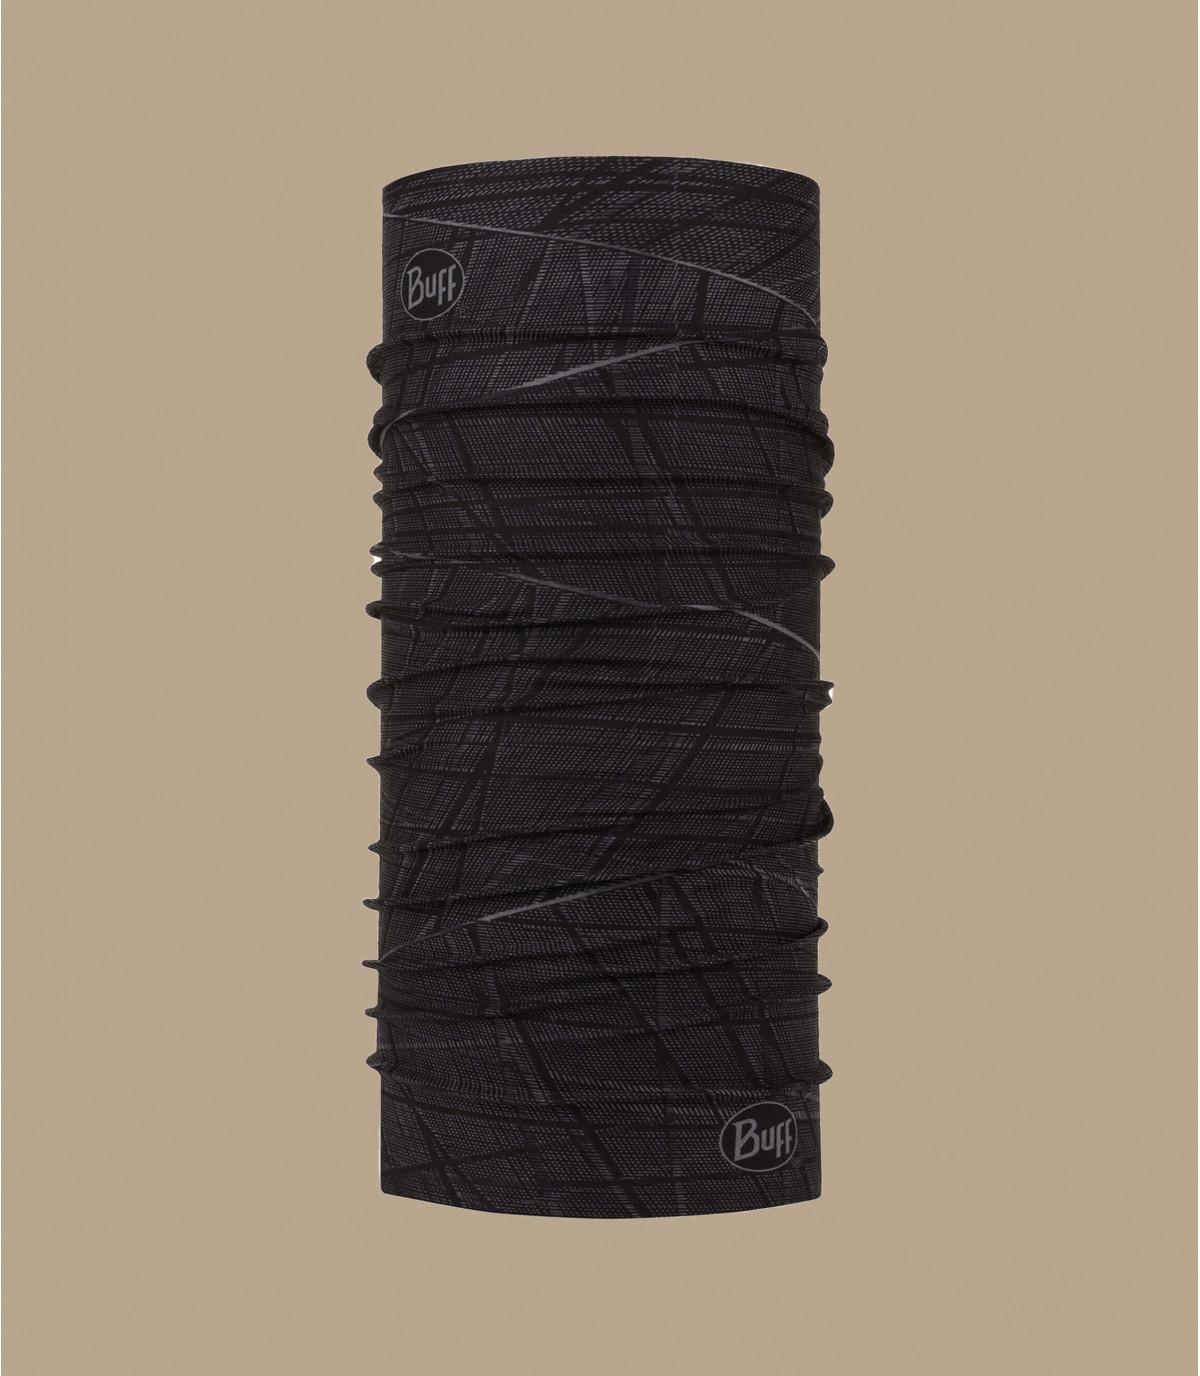 black print Buff